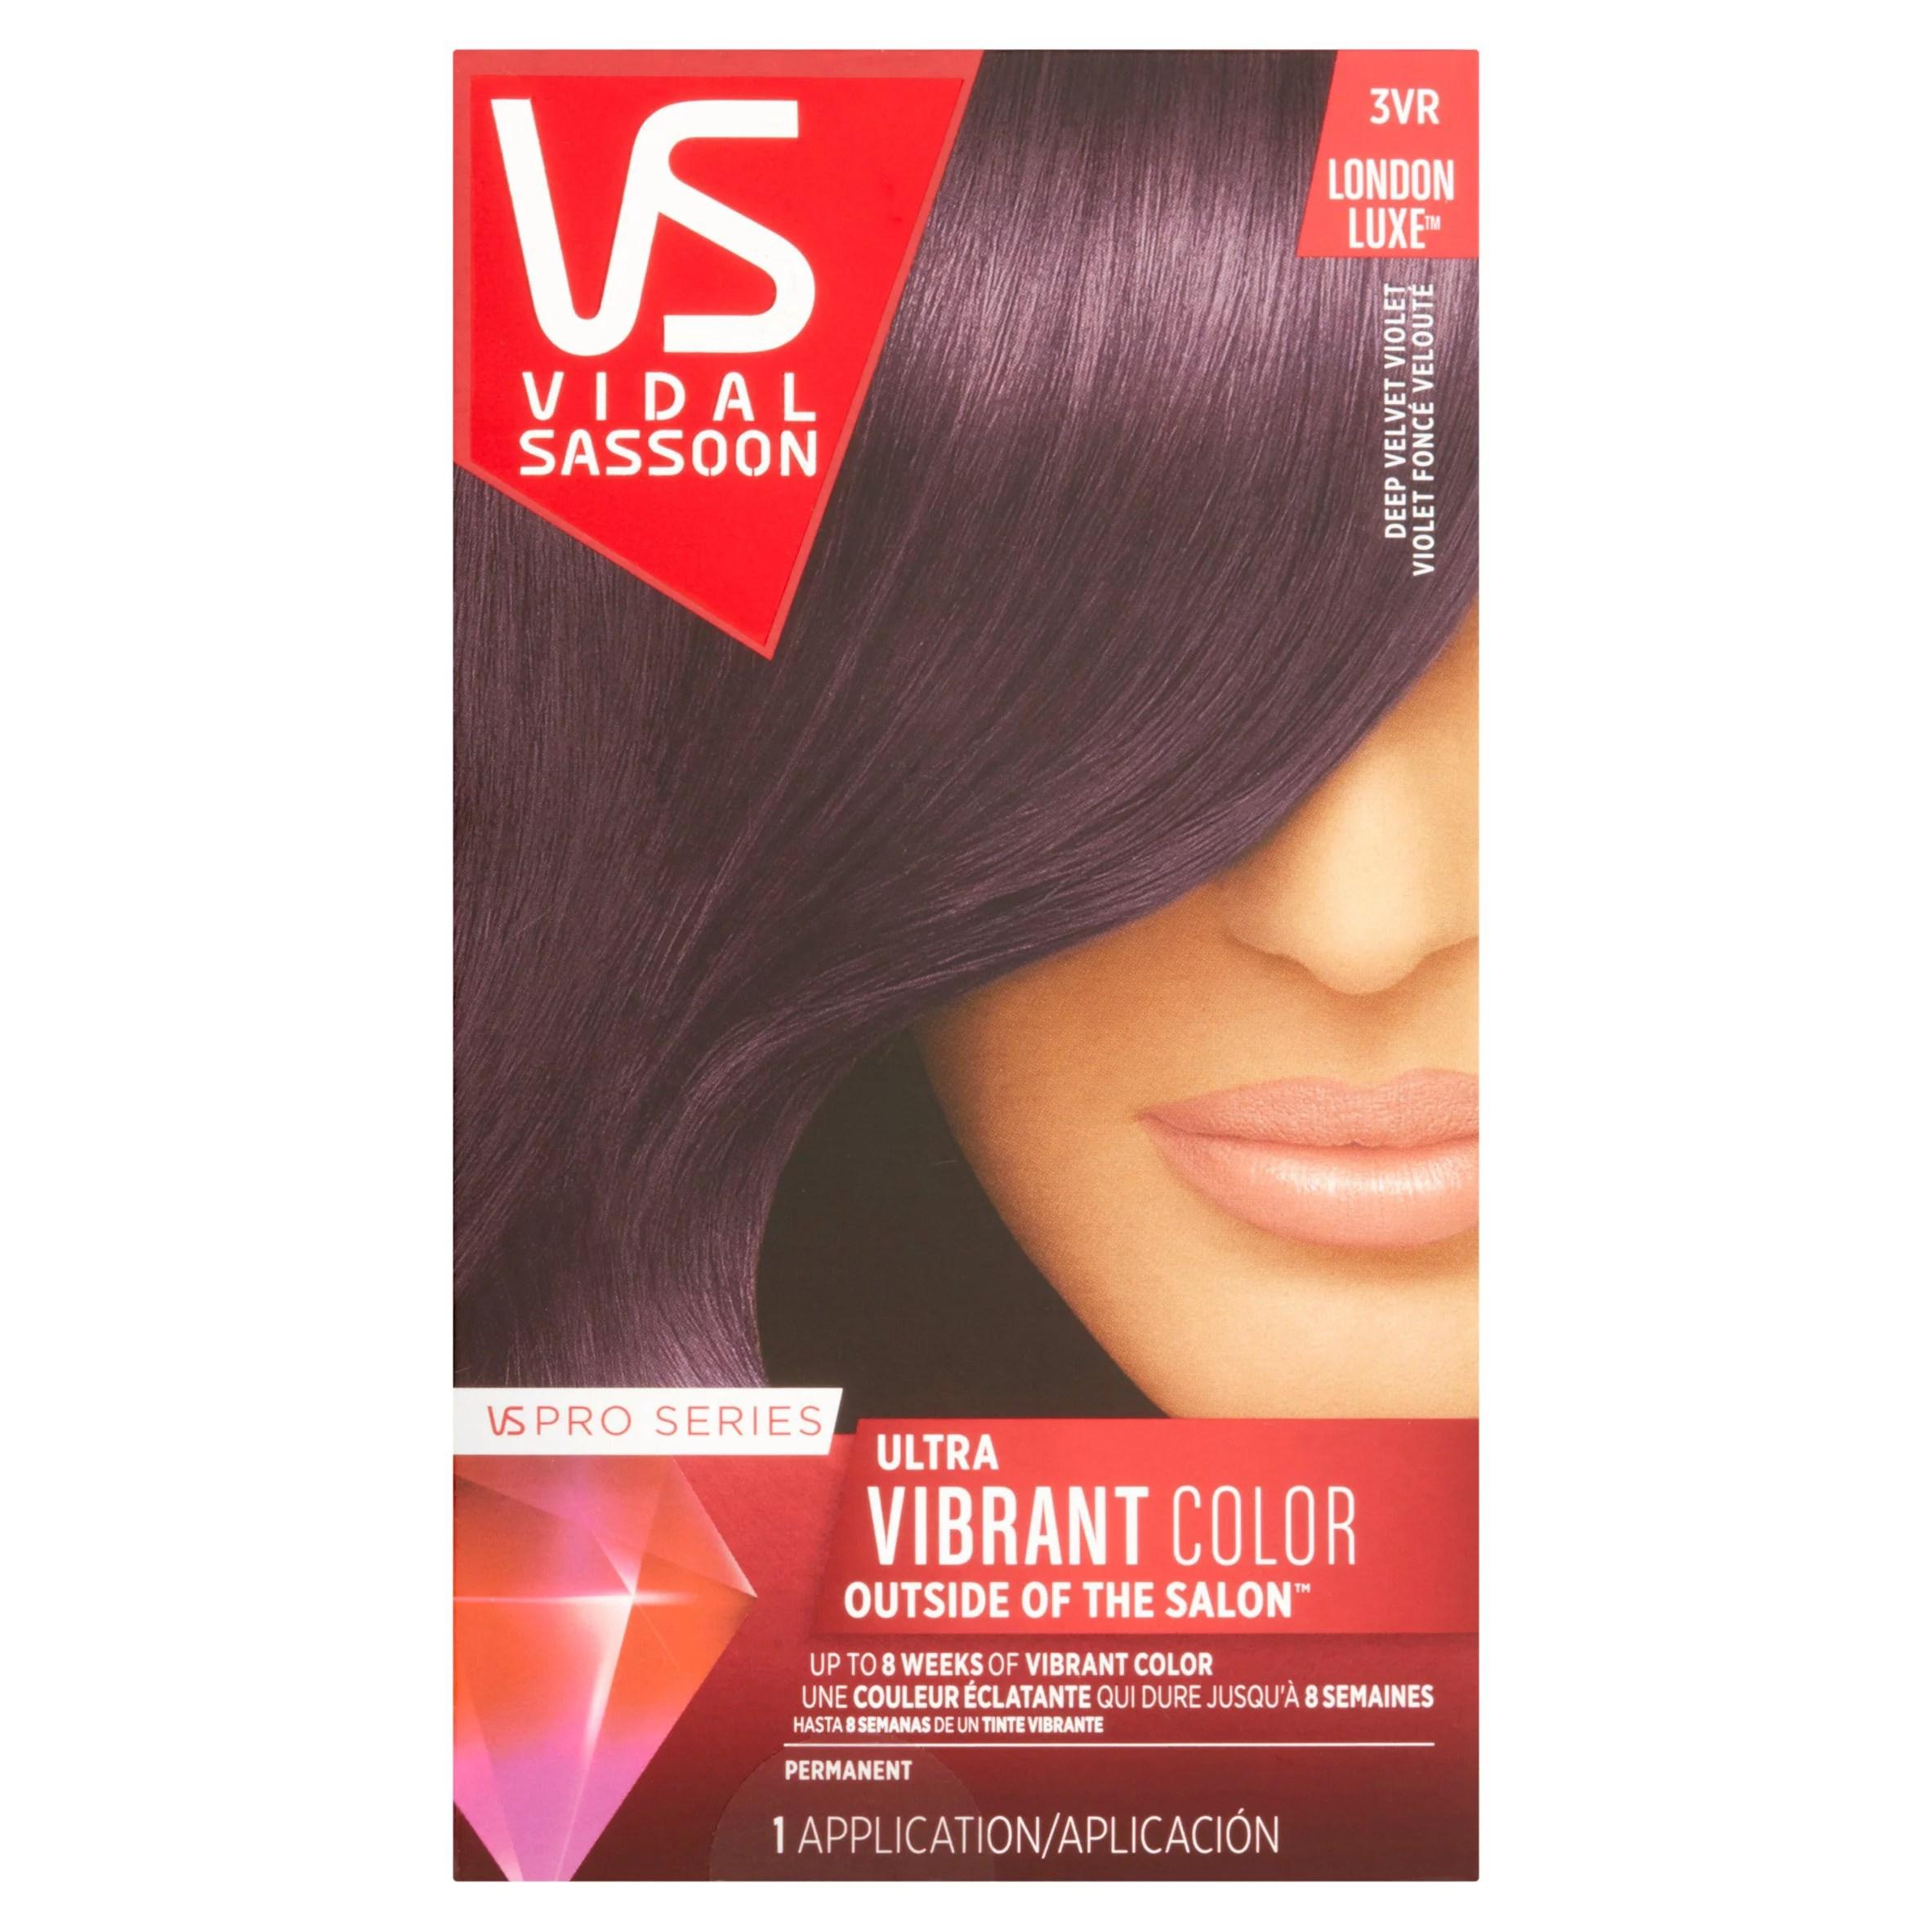 Vidal sassoon pro series ultra vibrant color vr deep velvet violet hair application also rh walmart